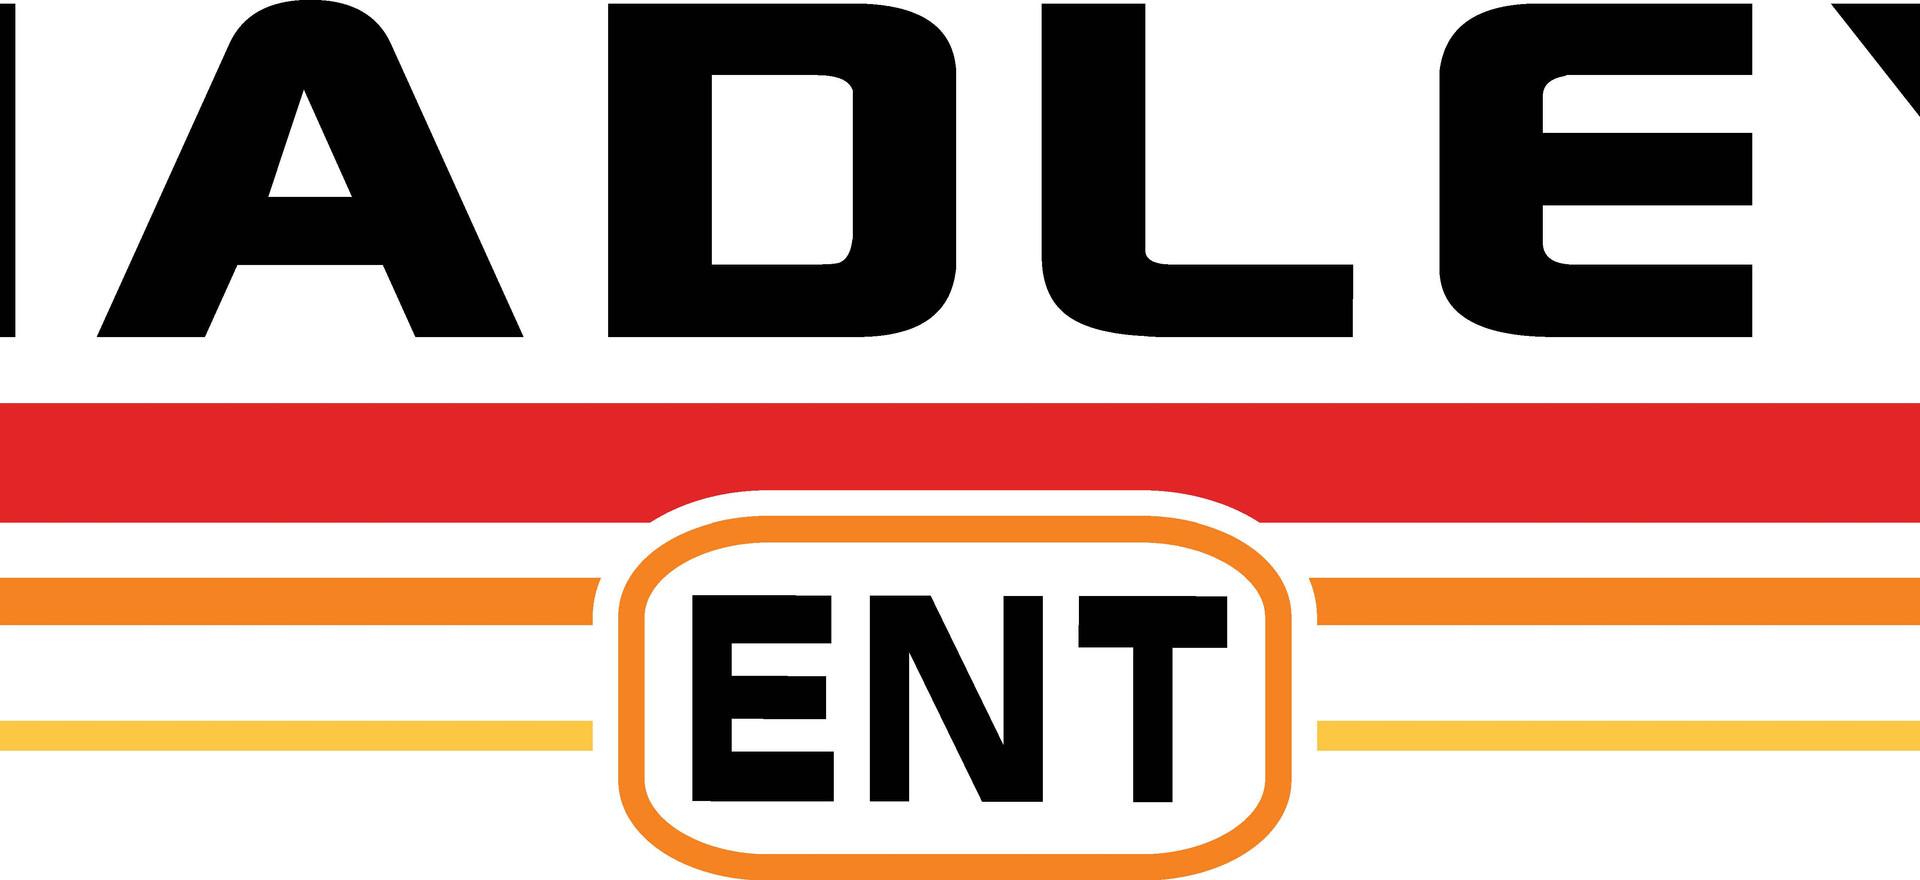 Hadley Enterprises Logo.jpg